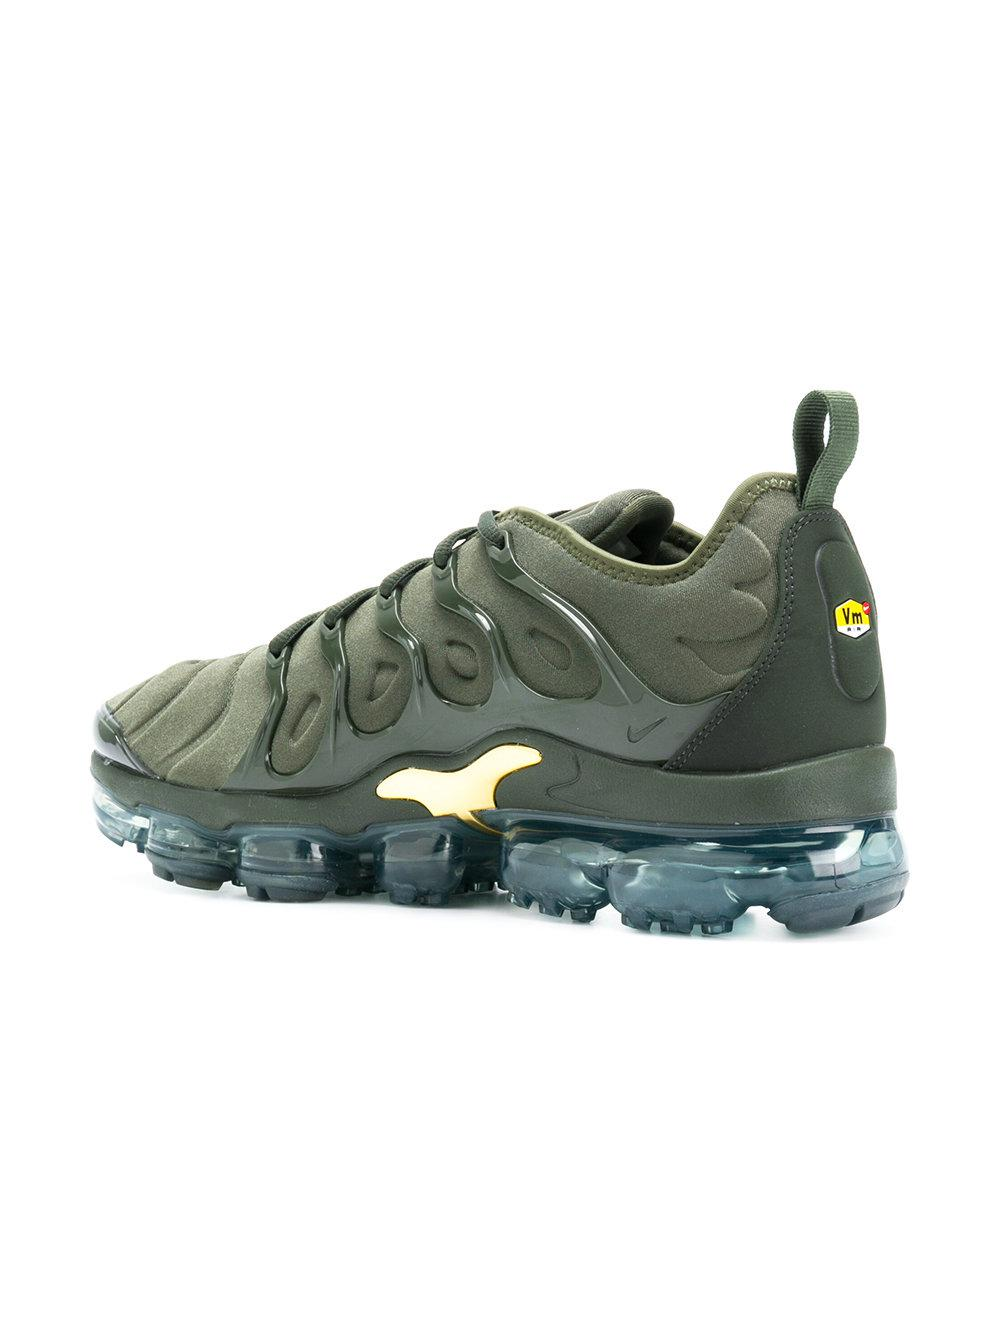 best sneakers f2462 dd3e0 Nike Green Air Vapormax Plus Tn Sneakers for men